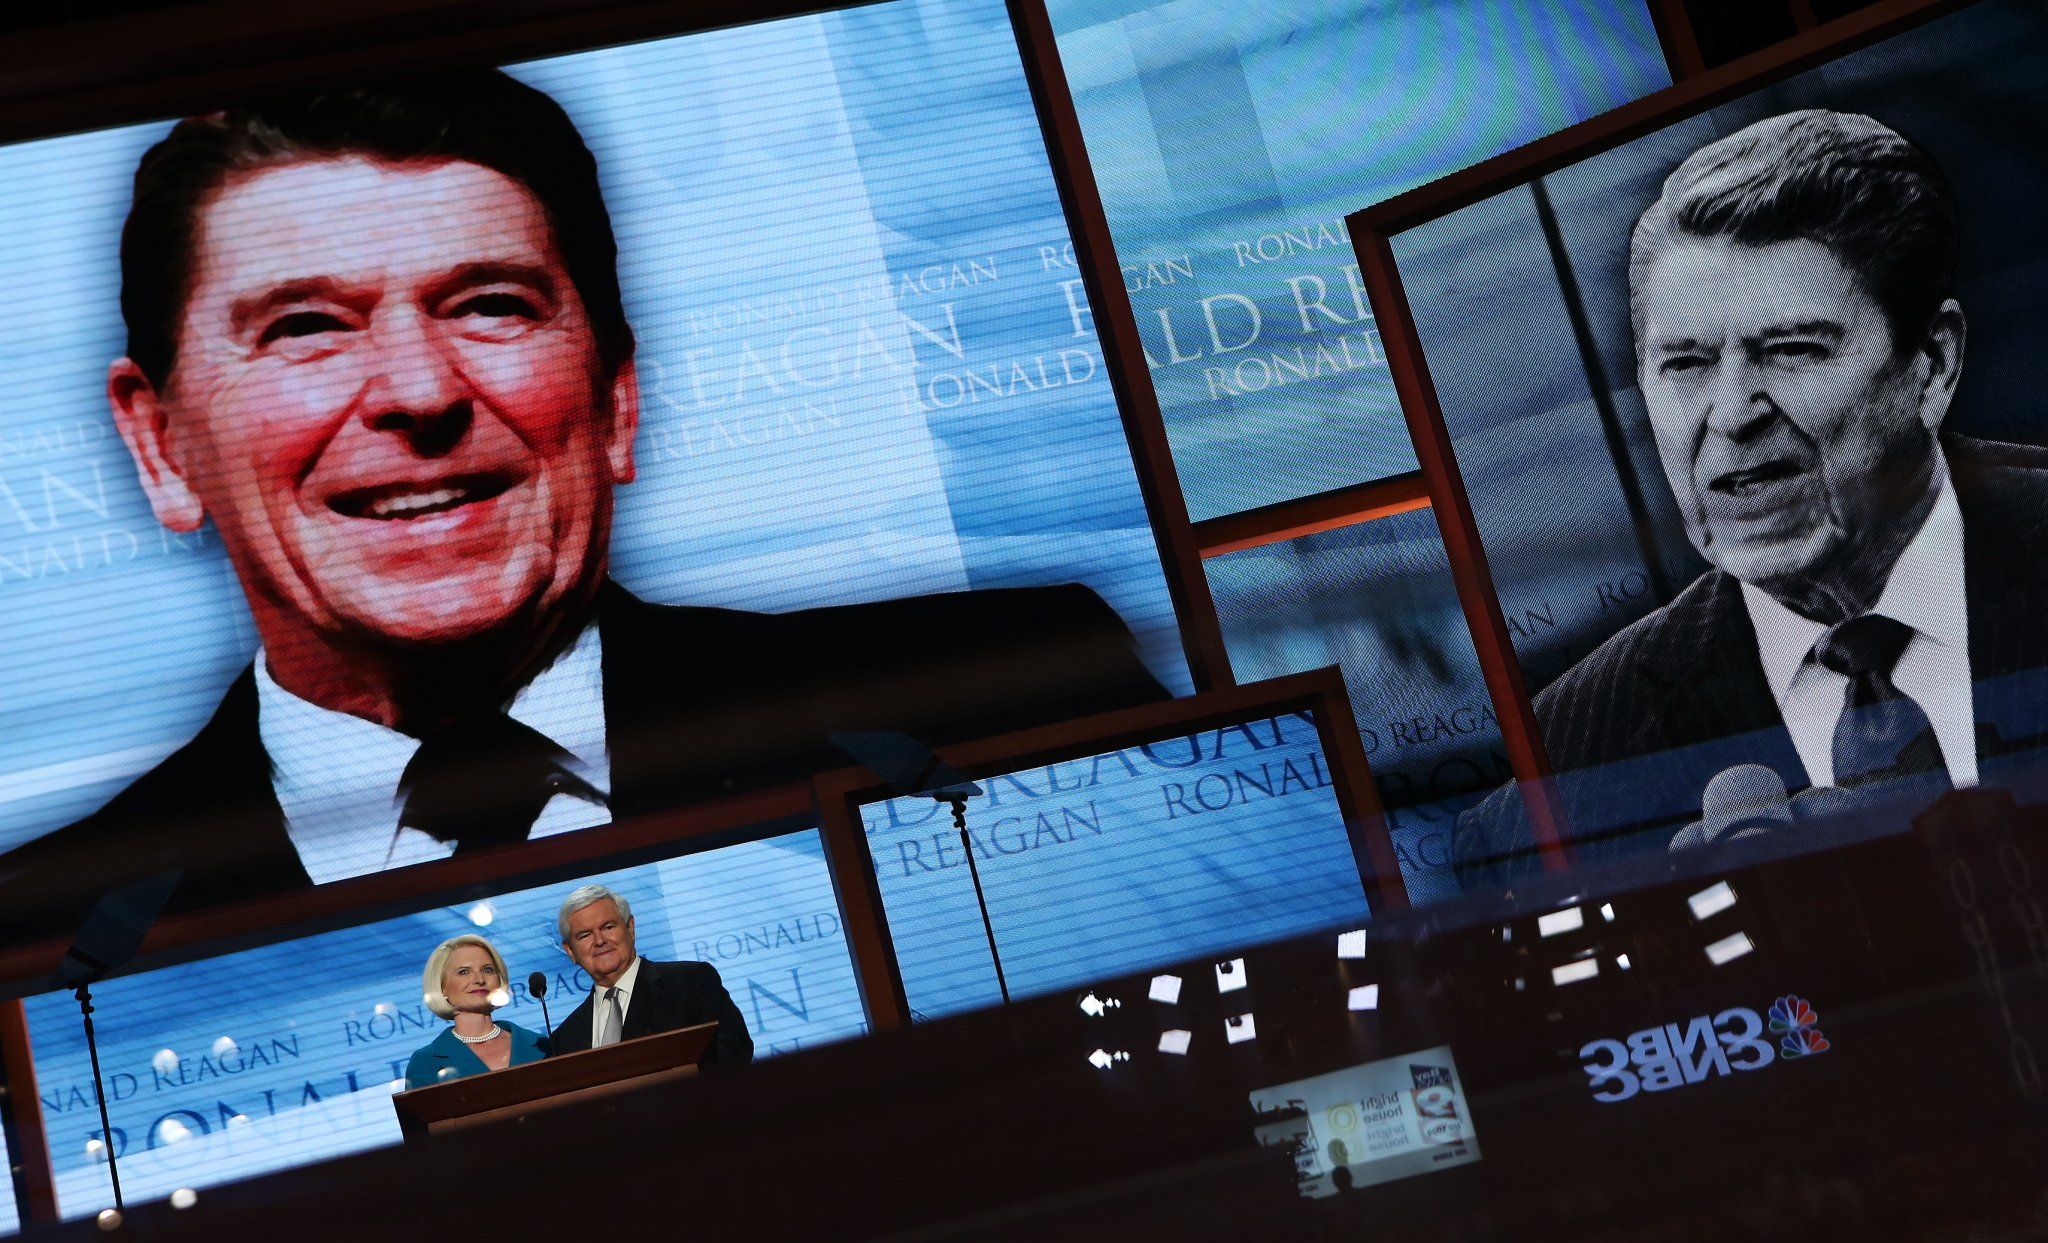 romneys republican national convention speech analysis